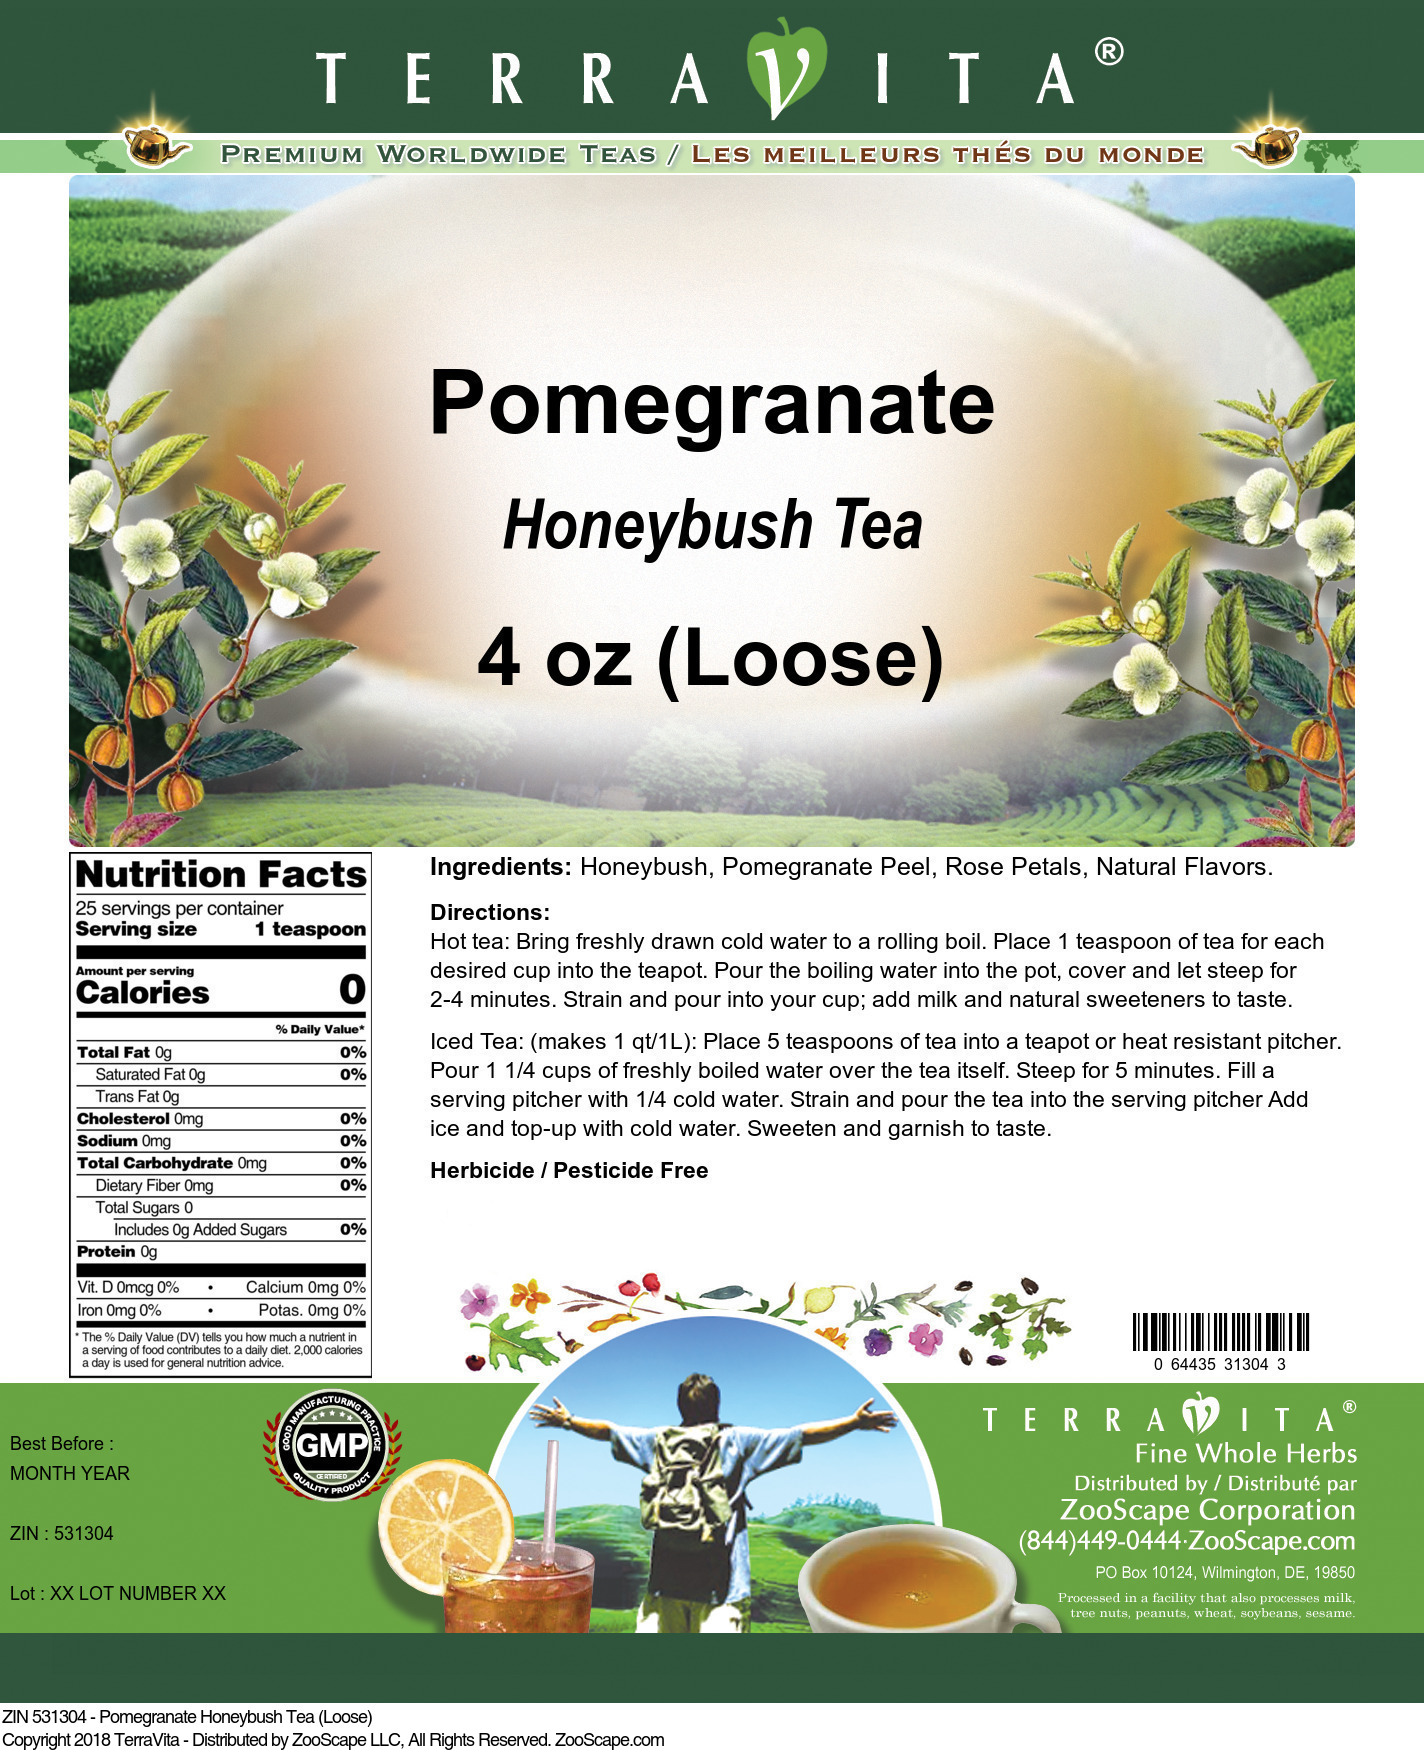 Pomegranate Honeybush Tea